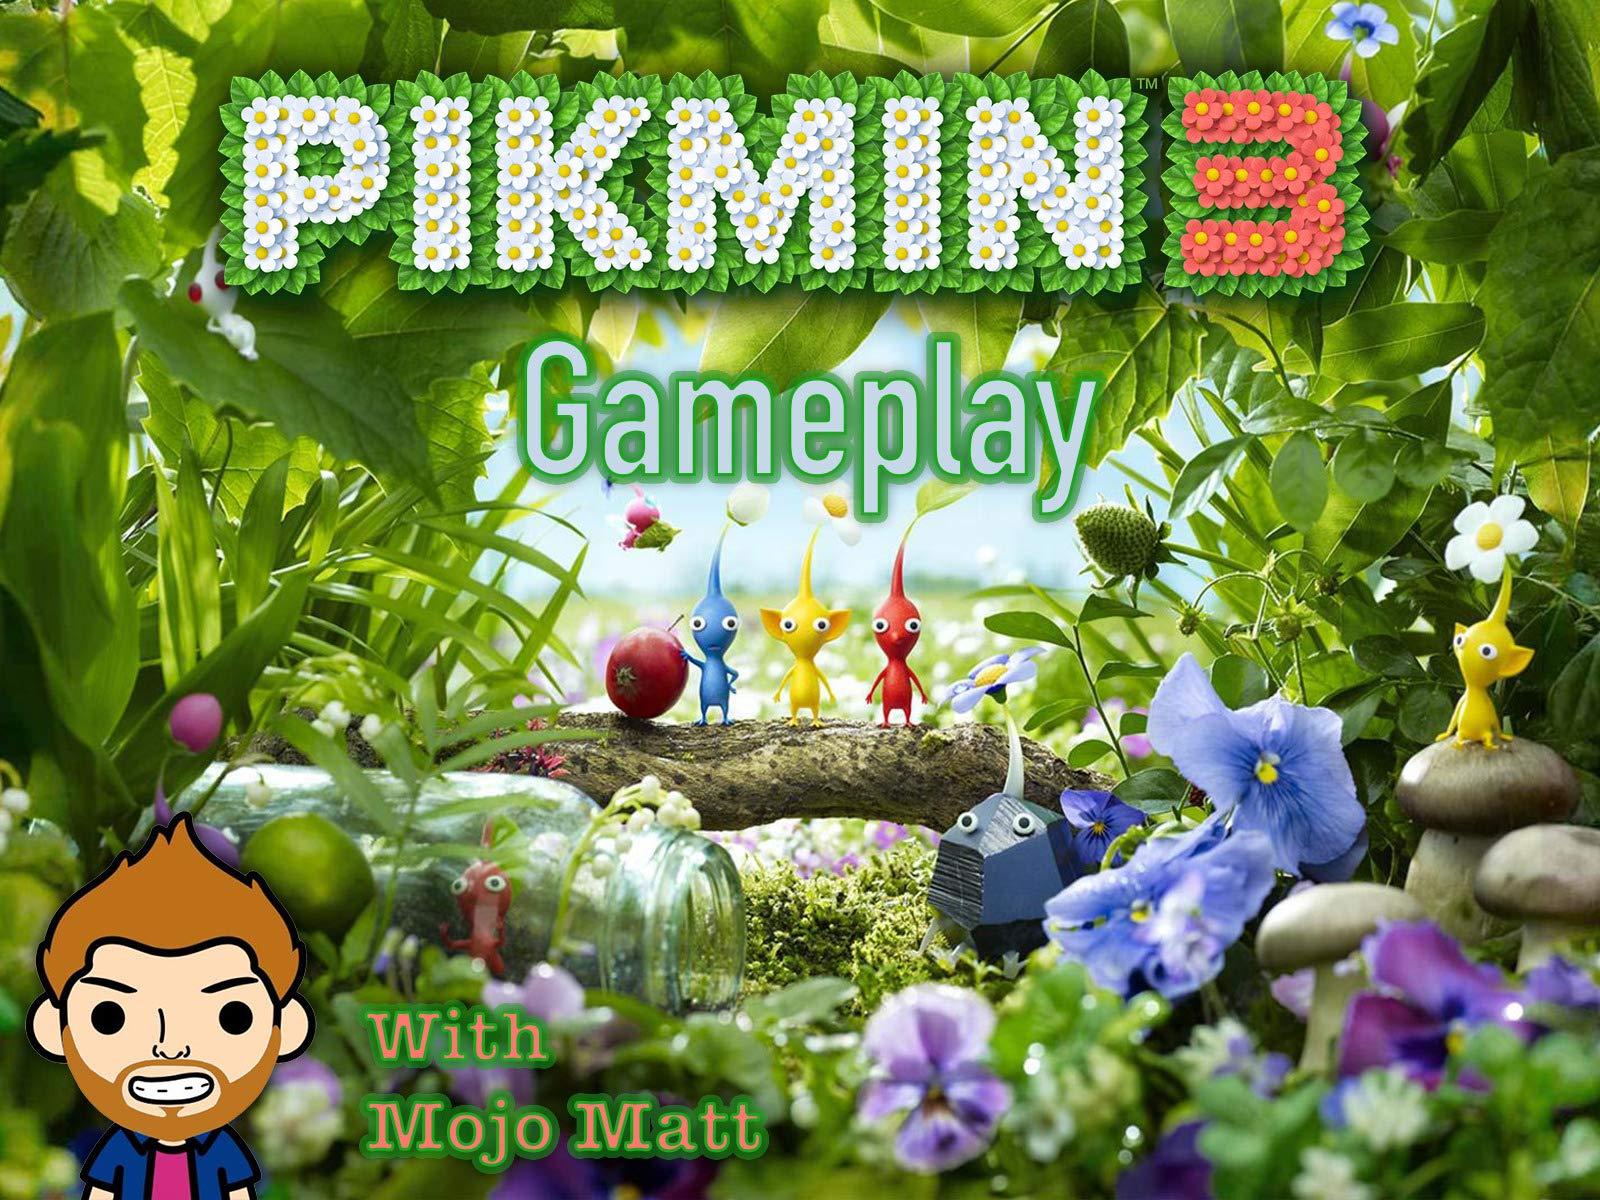 Pikmin 3 Gameplay With Mojo Matt on Amazon Prime Instant Video UK